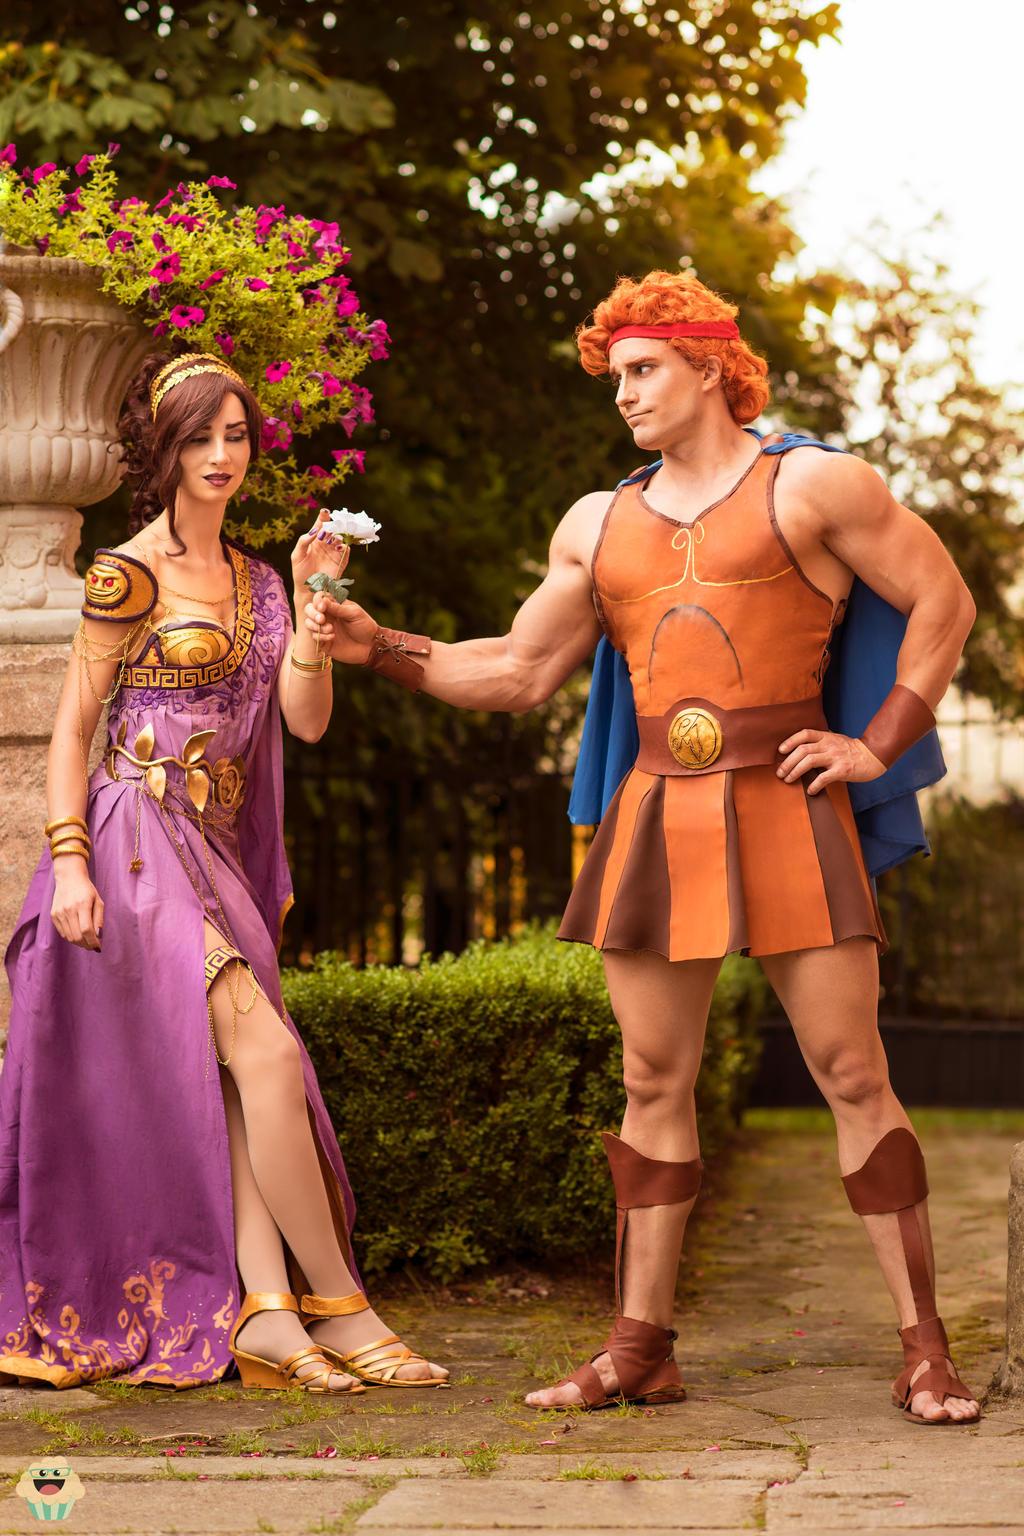 Disney cosplayers by LEOBANECOSPLAY on DeviantArt